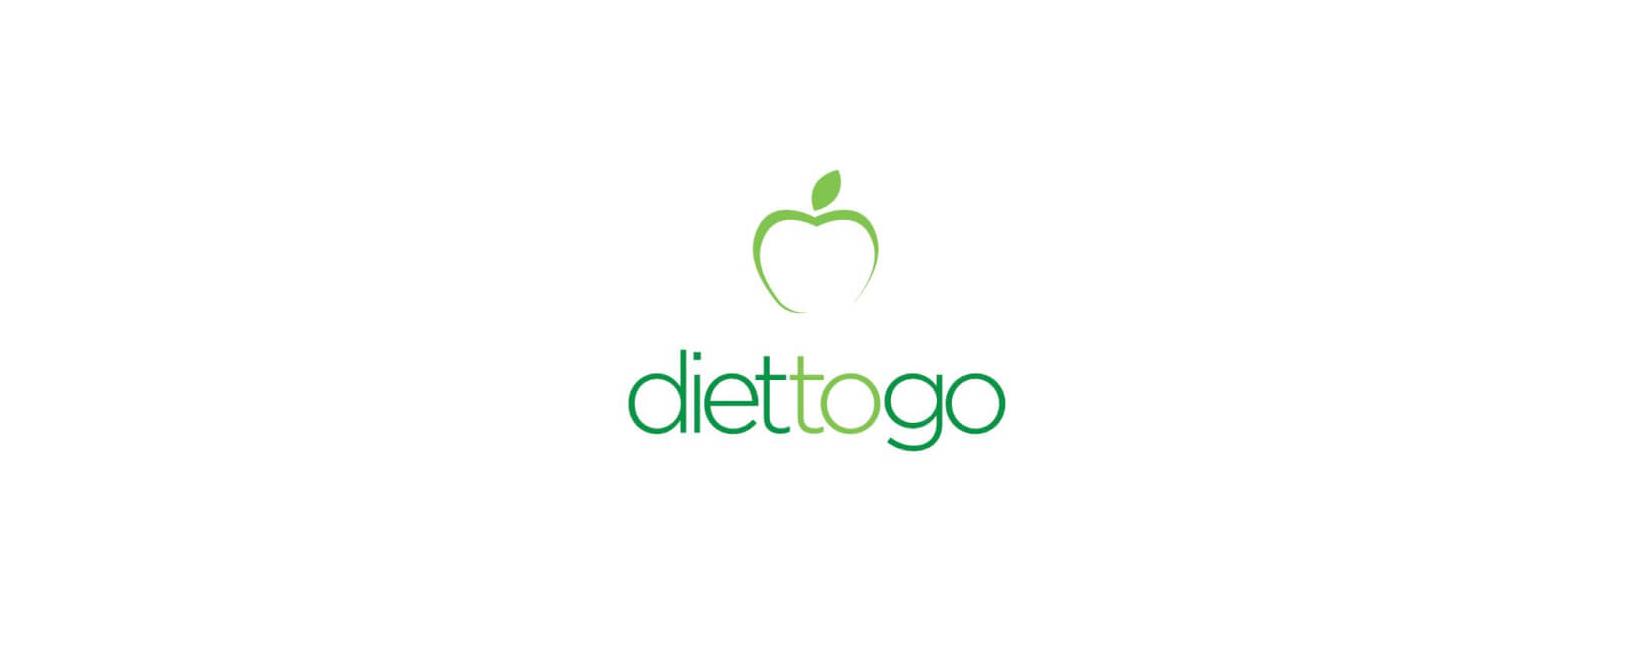 Diet-To-Go Discount Code 2021